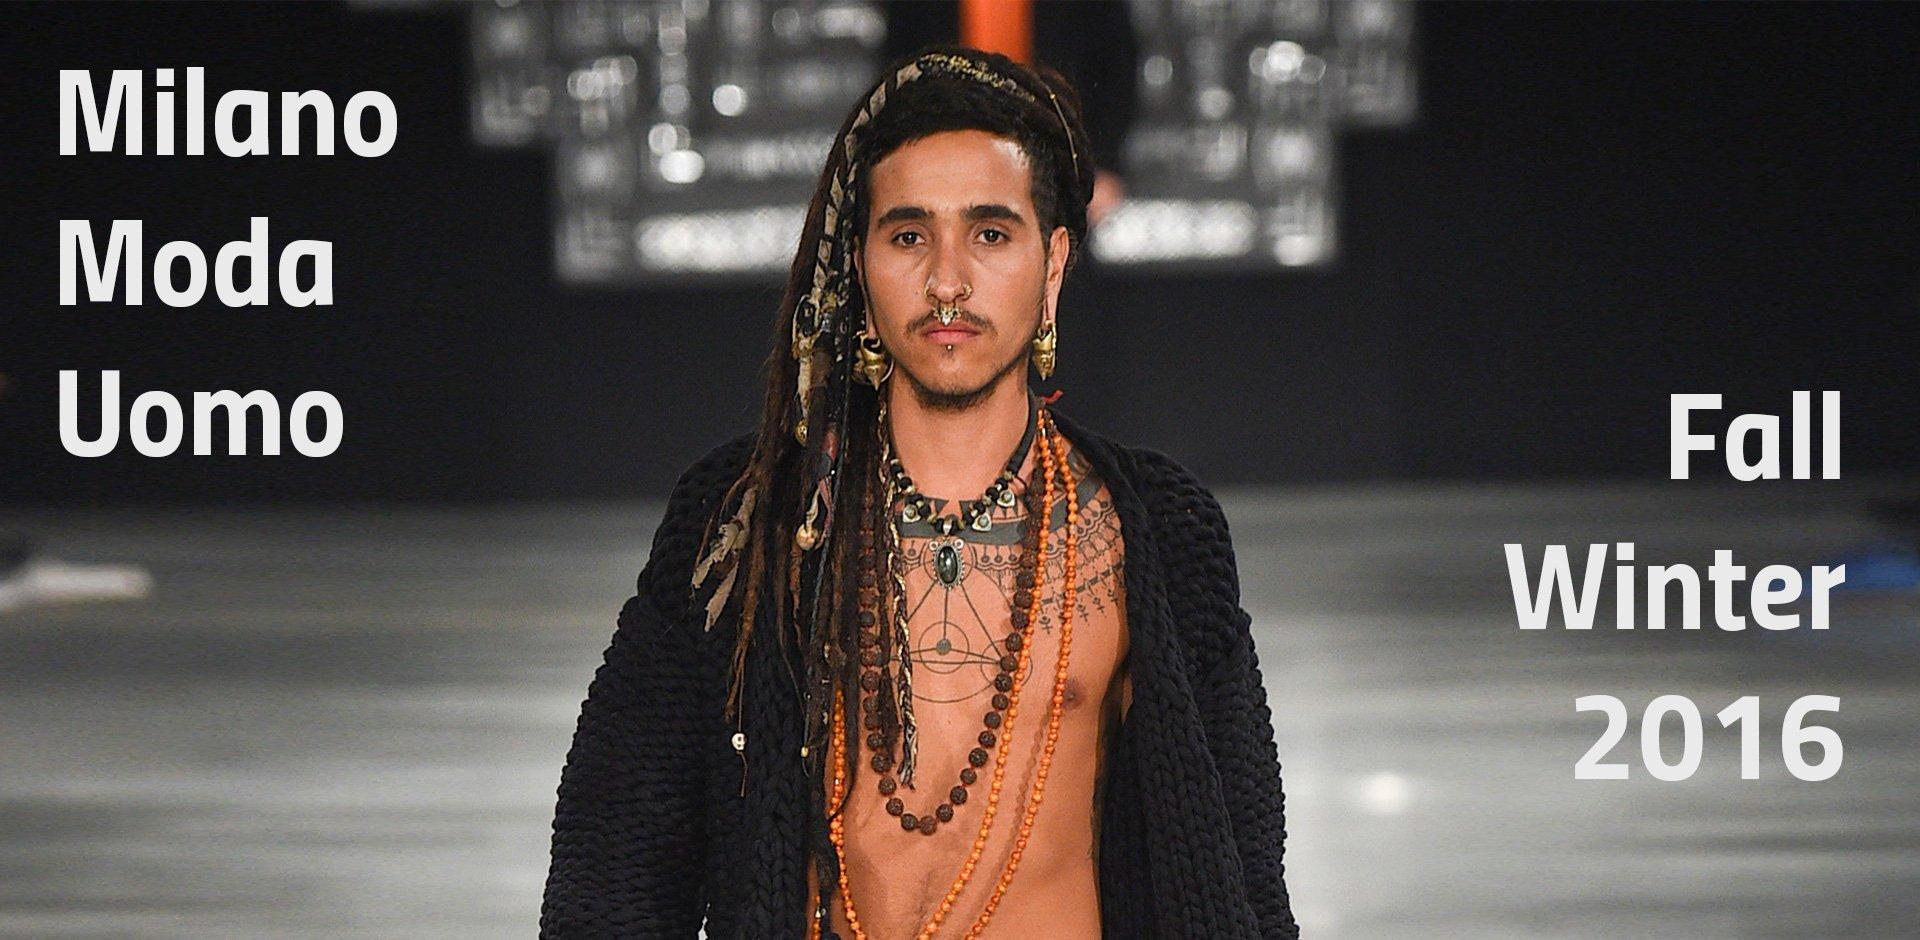 Milano moda uomo fall winter 2016 the fashion atlas for Milano 2016